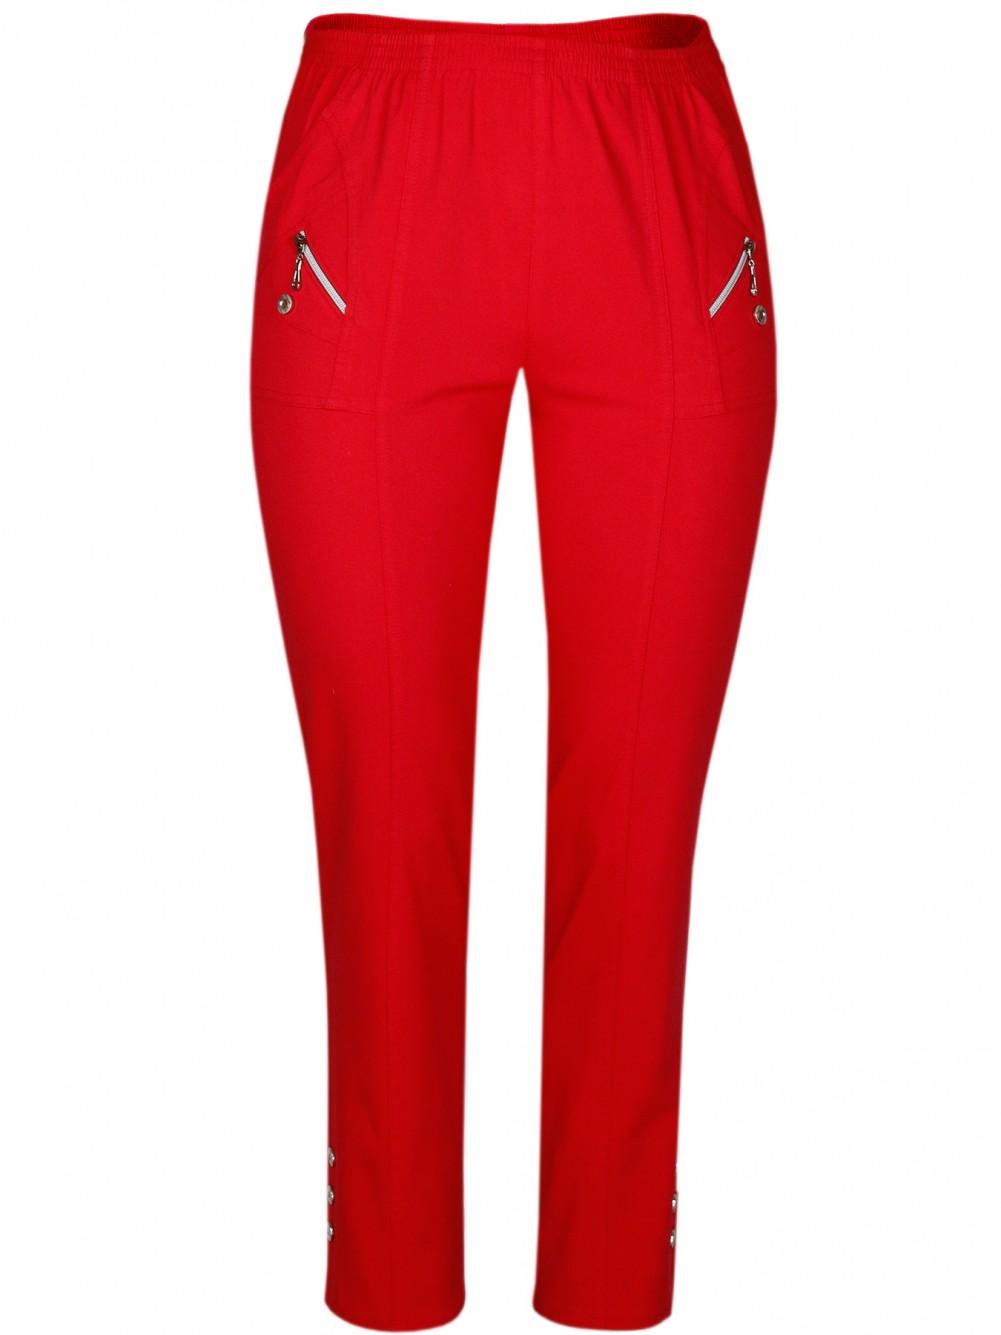 Damen Stretch Schlupfhose Sommer Kollektion - Rot